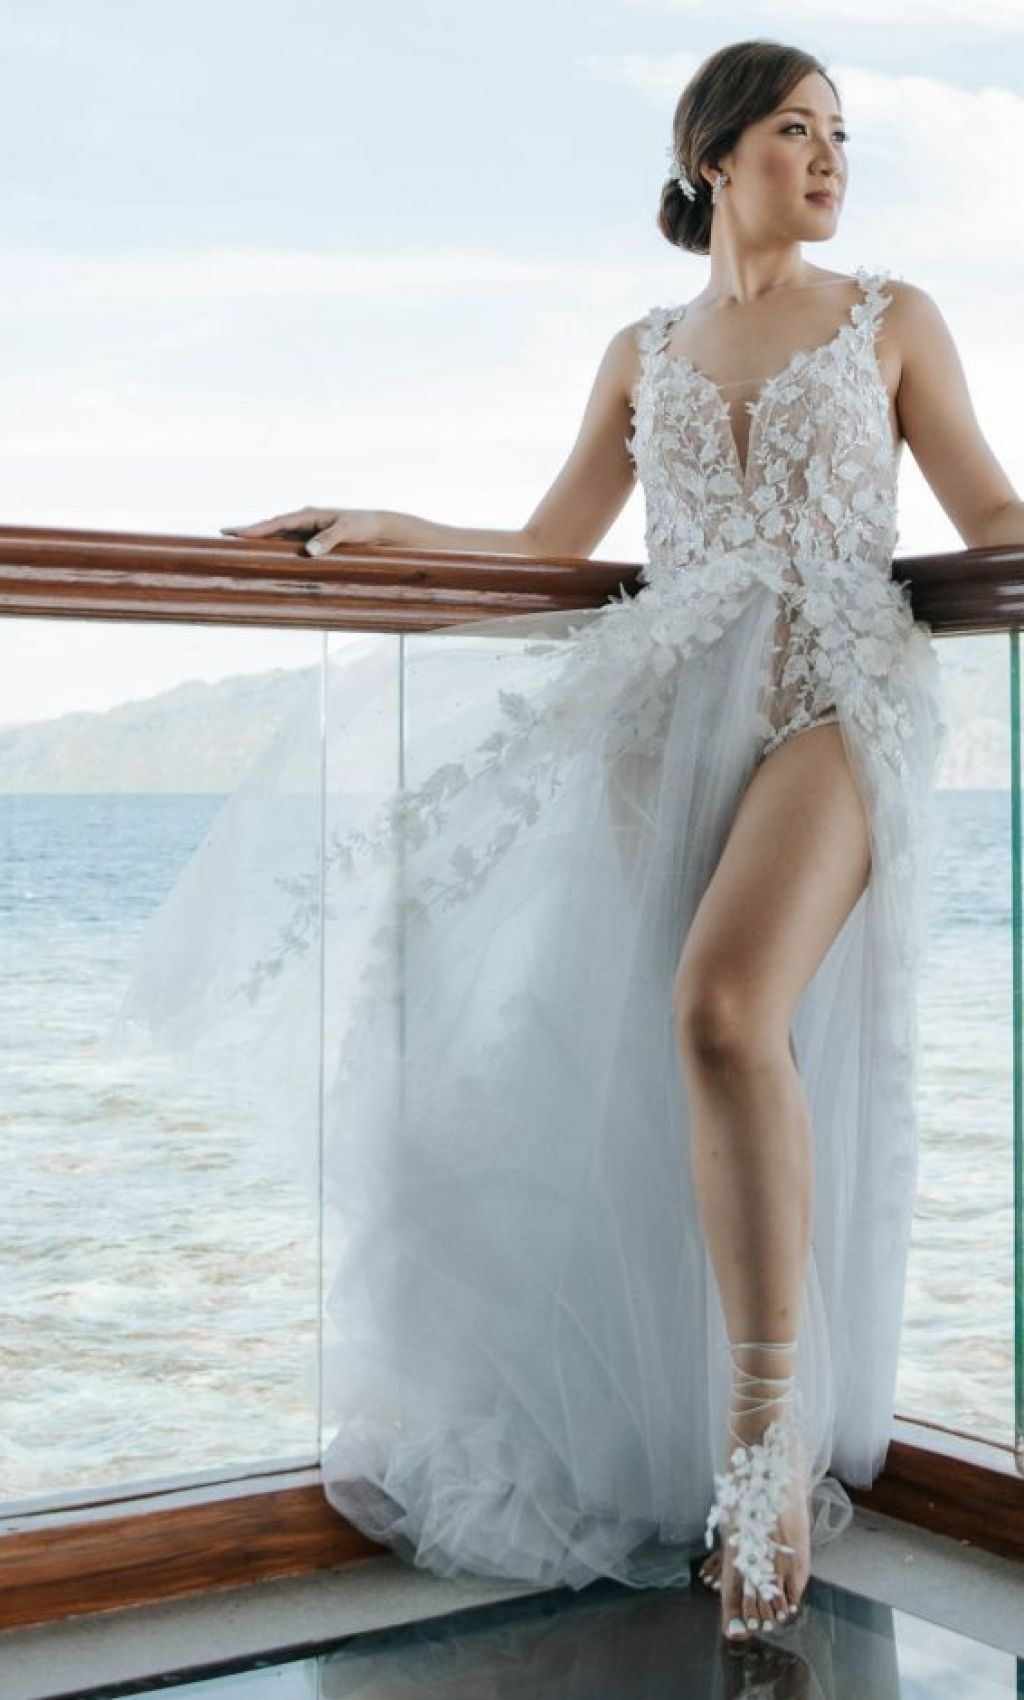 Robe de mariée personnalisée Patricia Santos